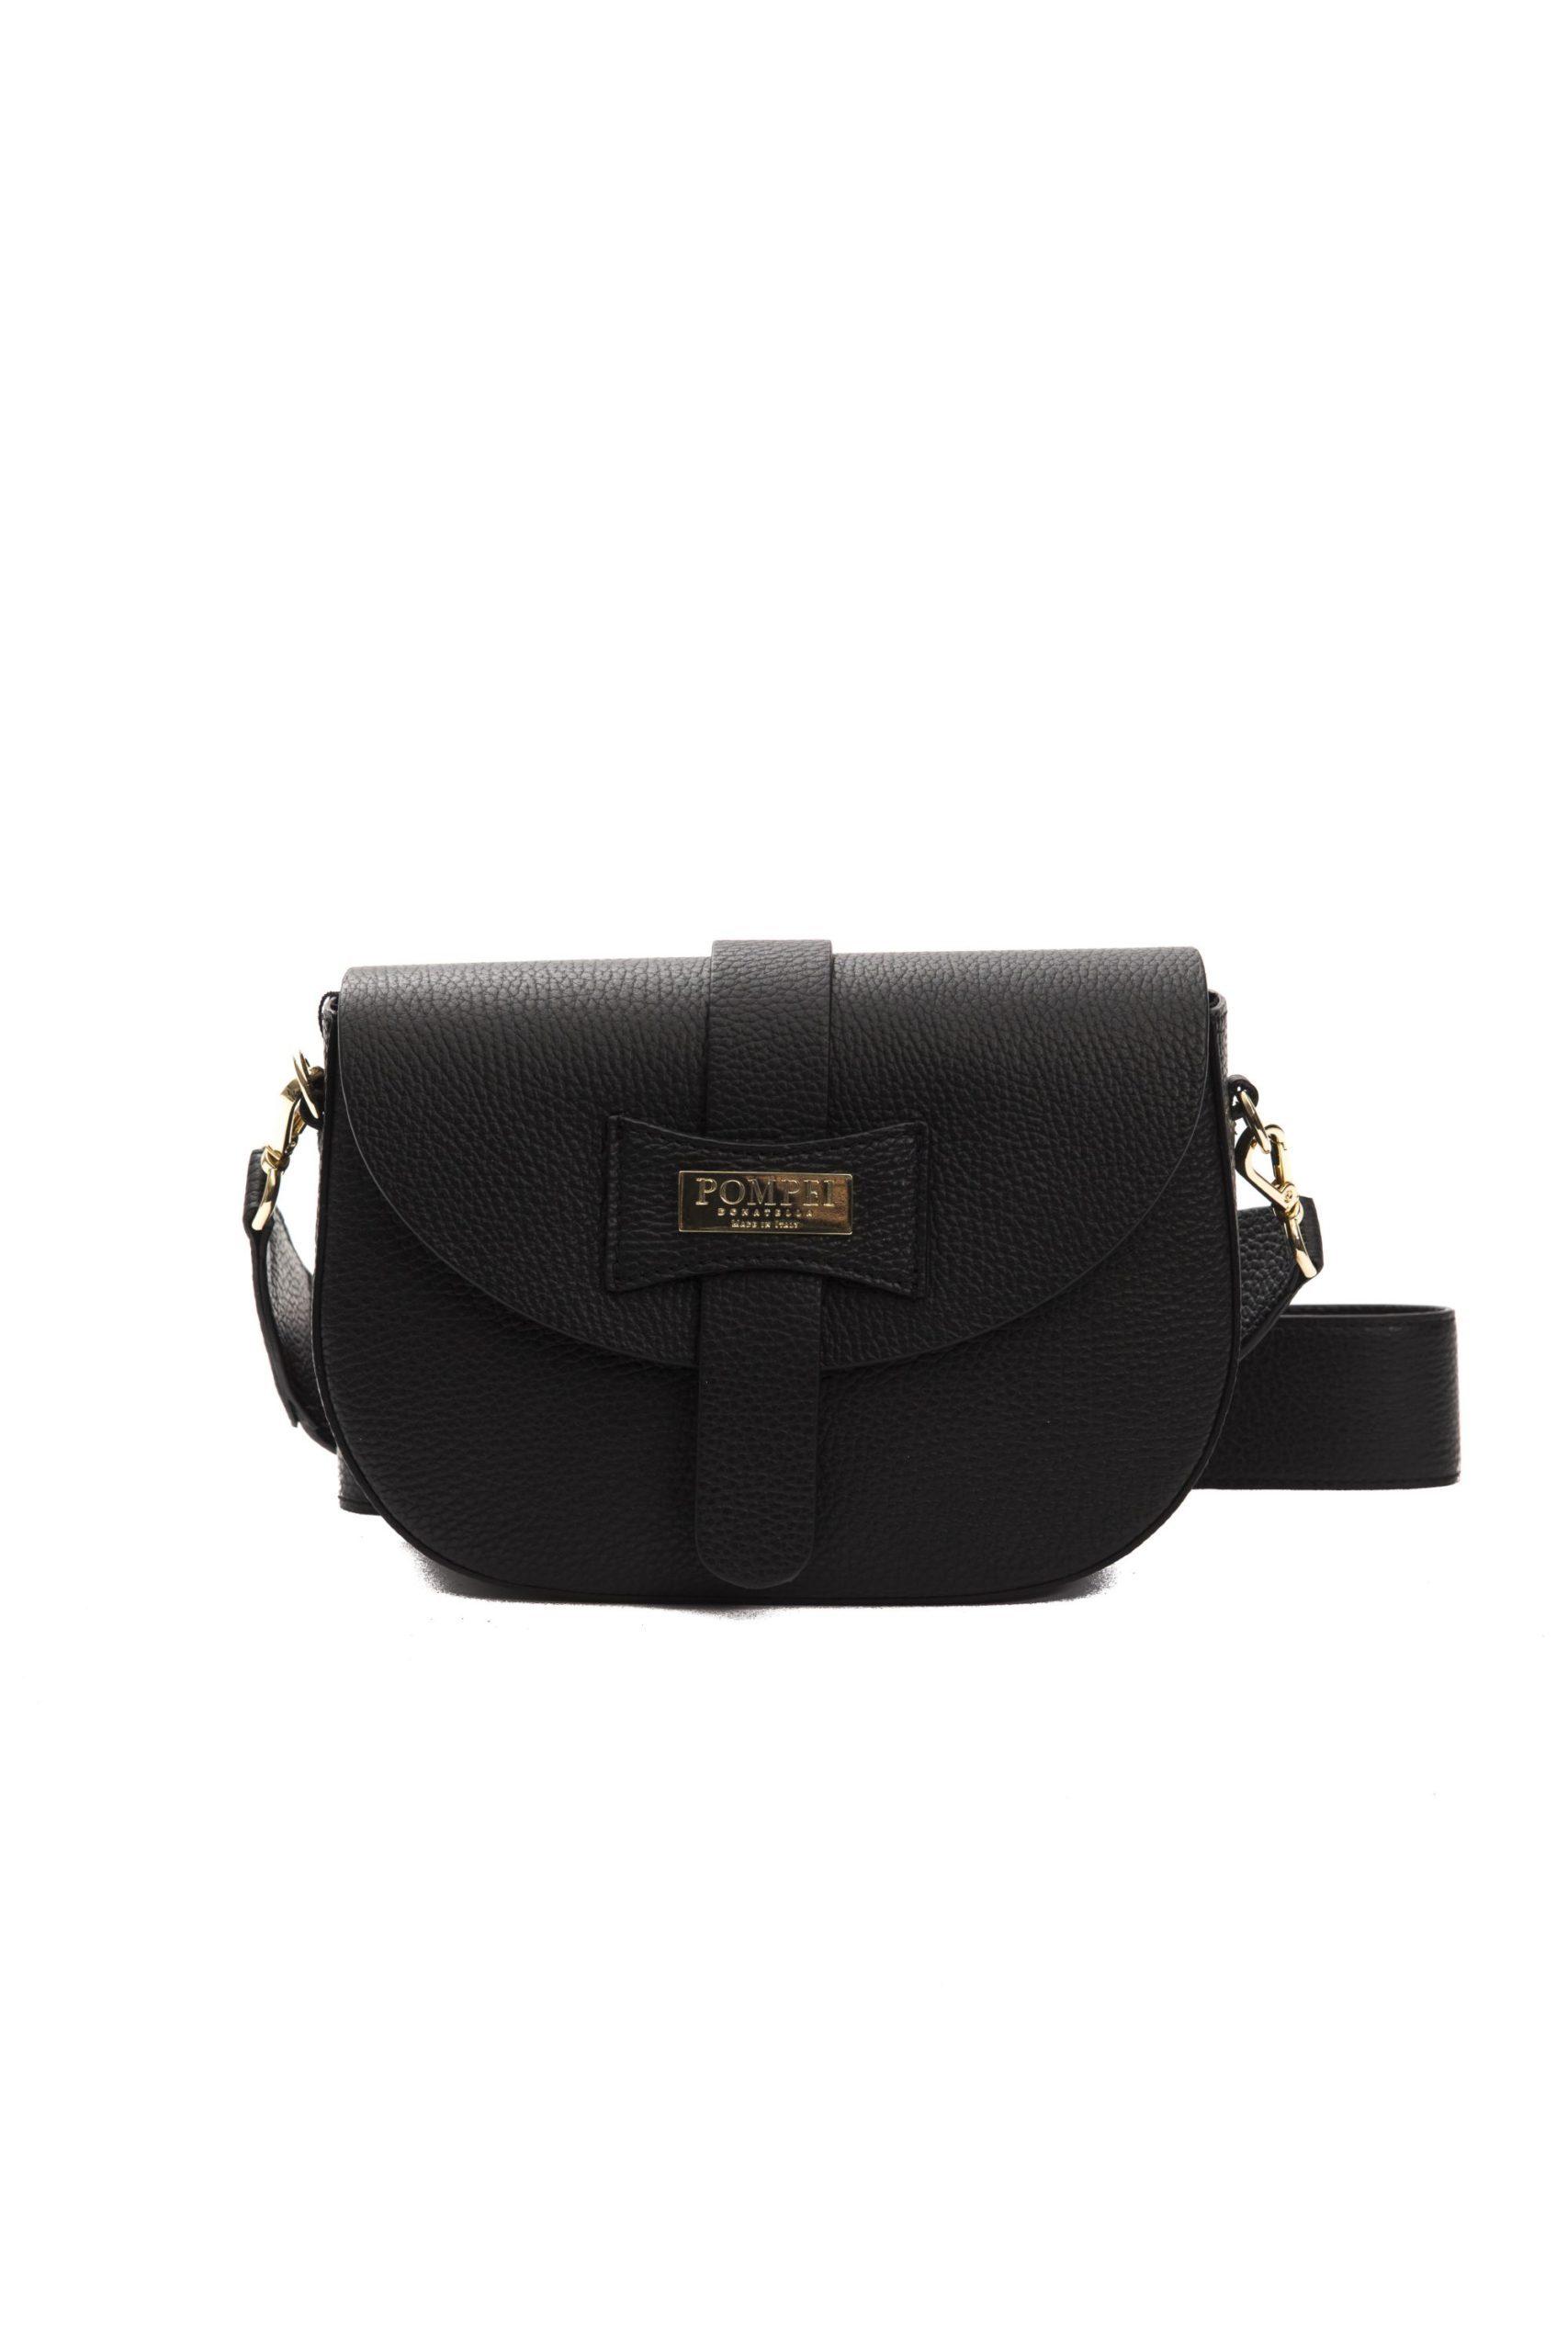 Pompei Donatella Women's Nero Crossbody Bag Black PO1004887